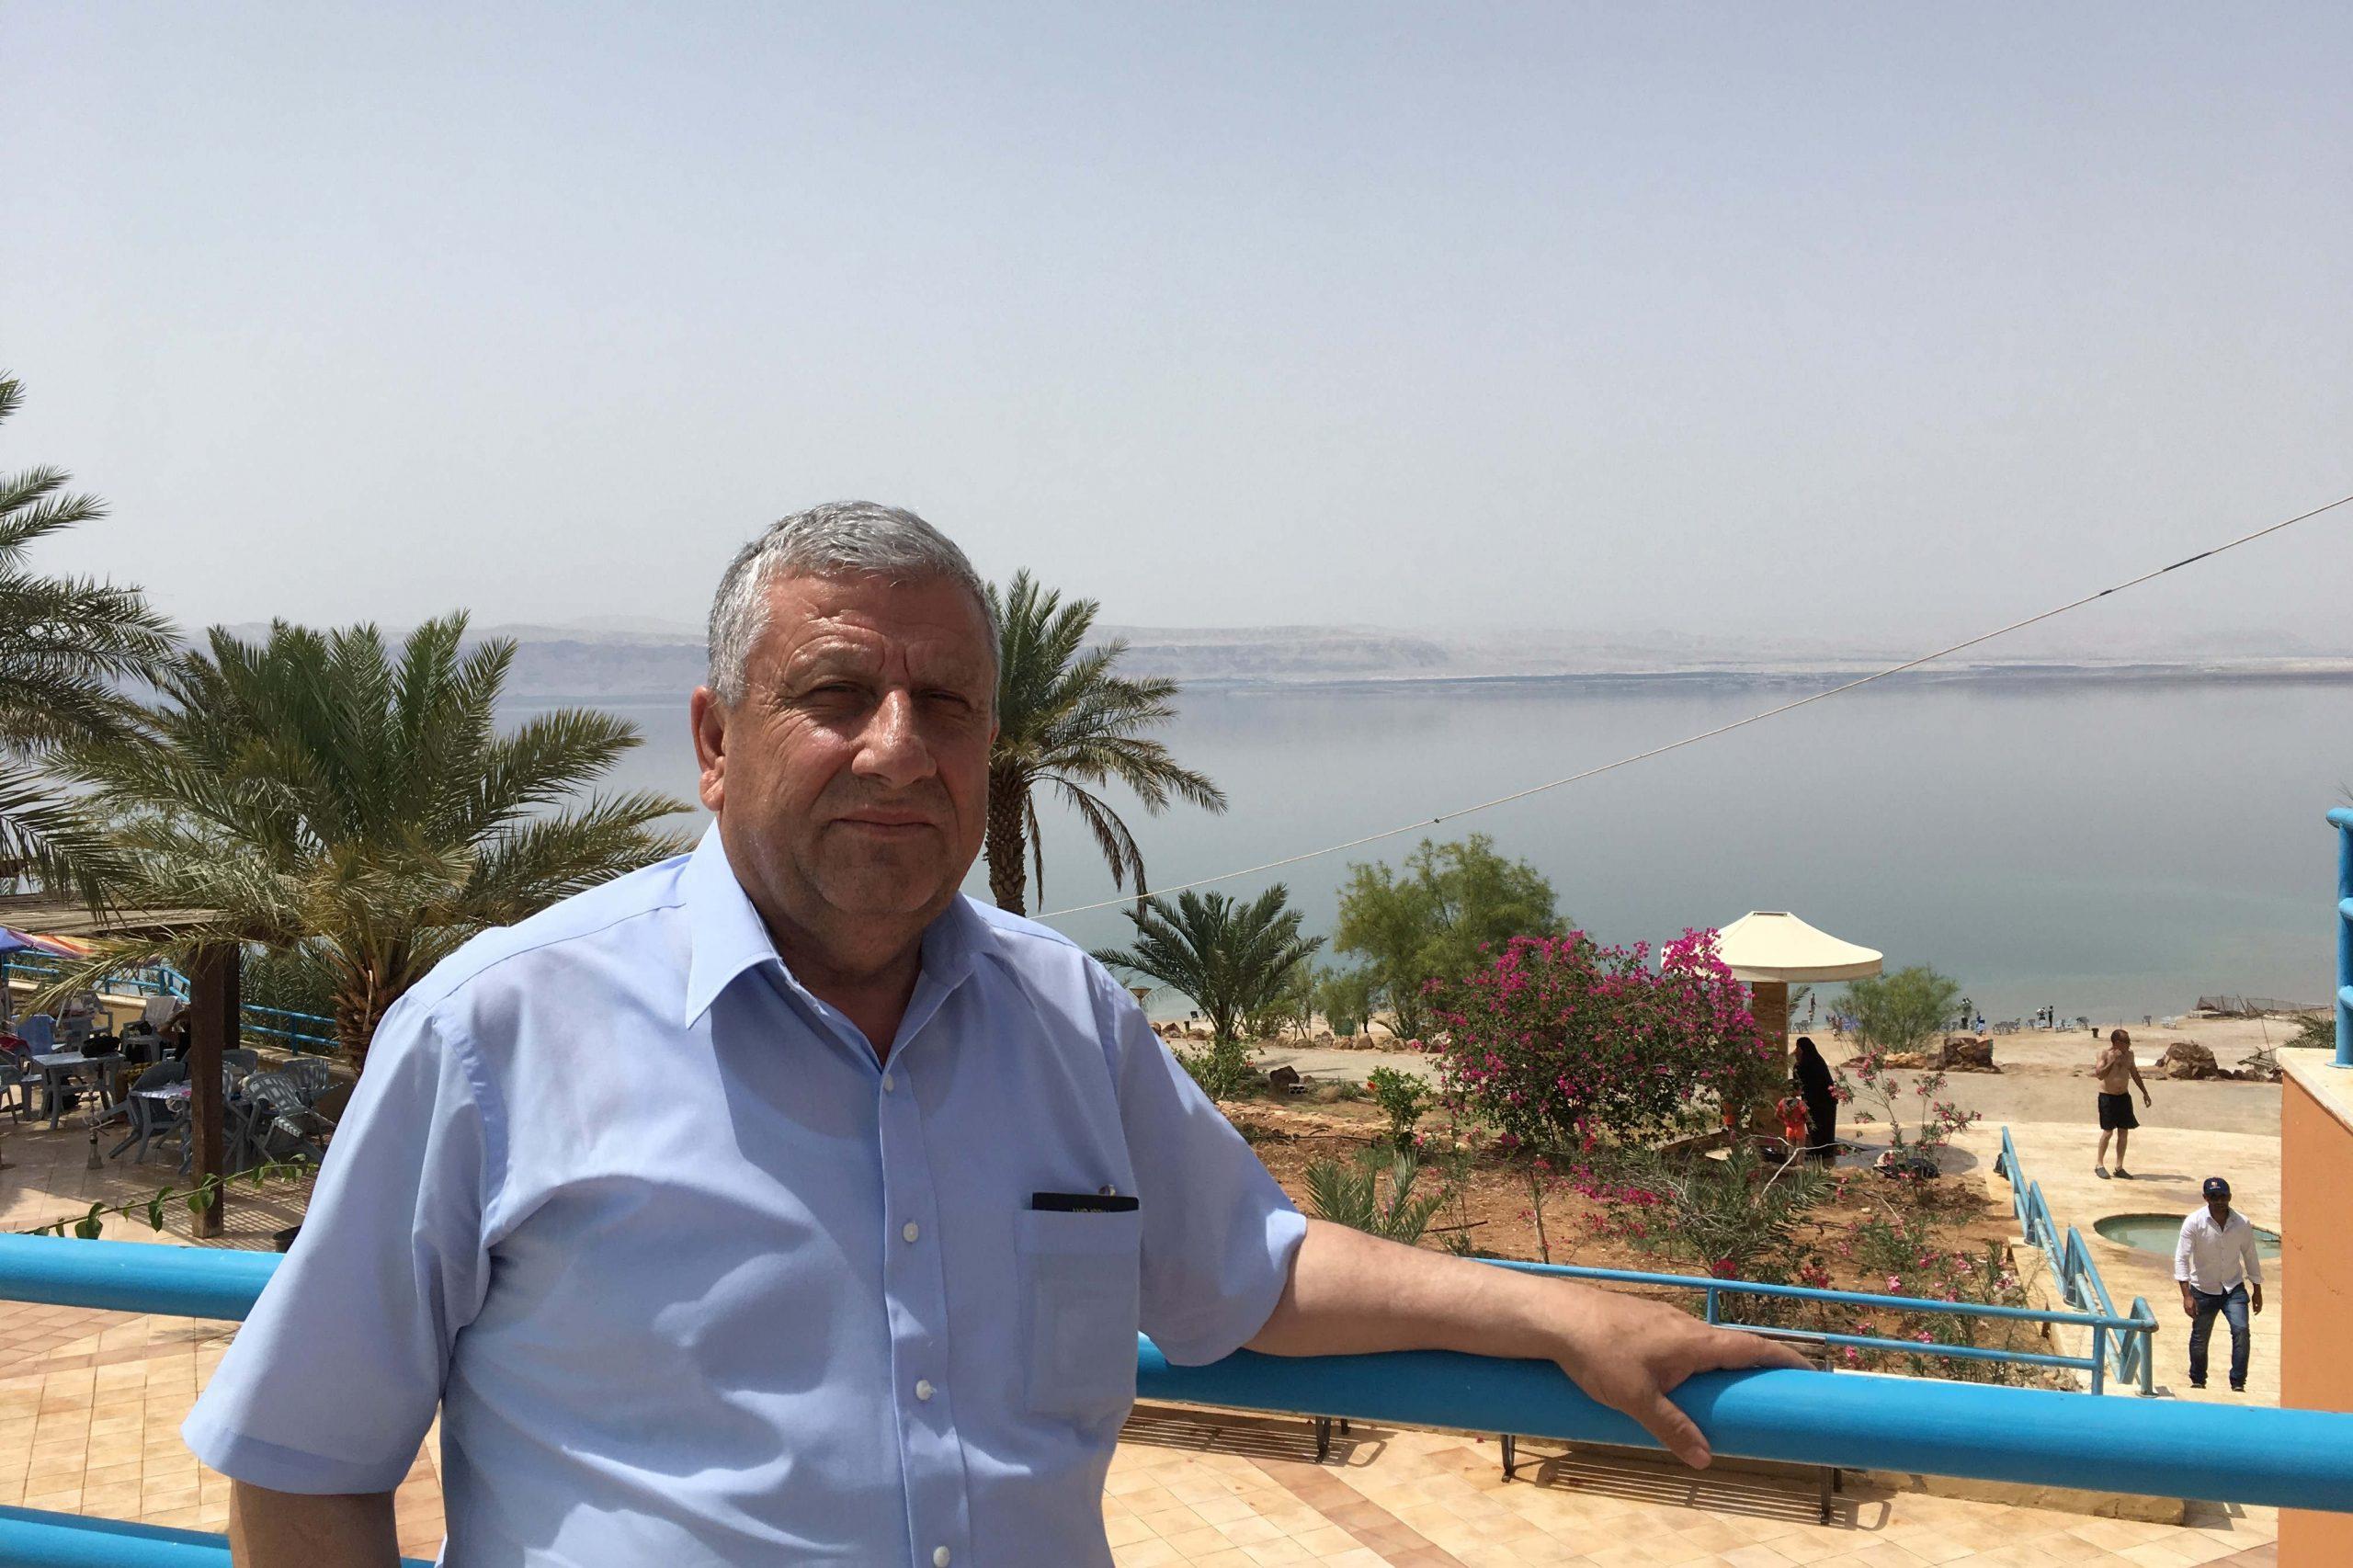 Yohanna Towaya un humanitaire irakien(credit B.Kanabus)